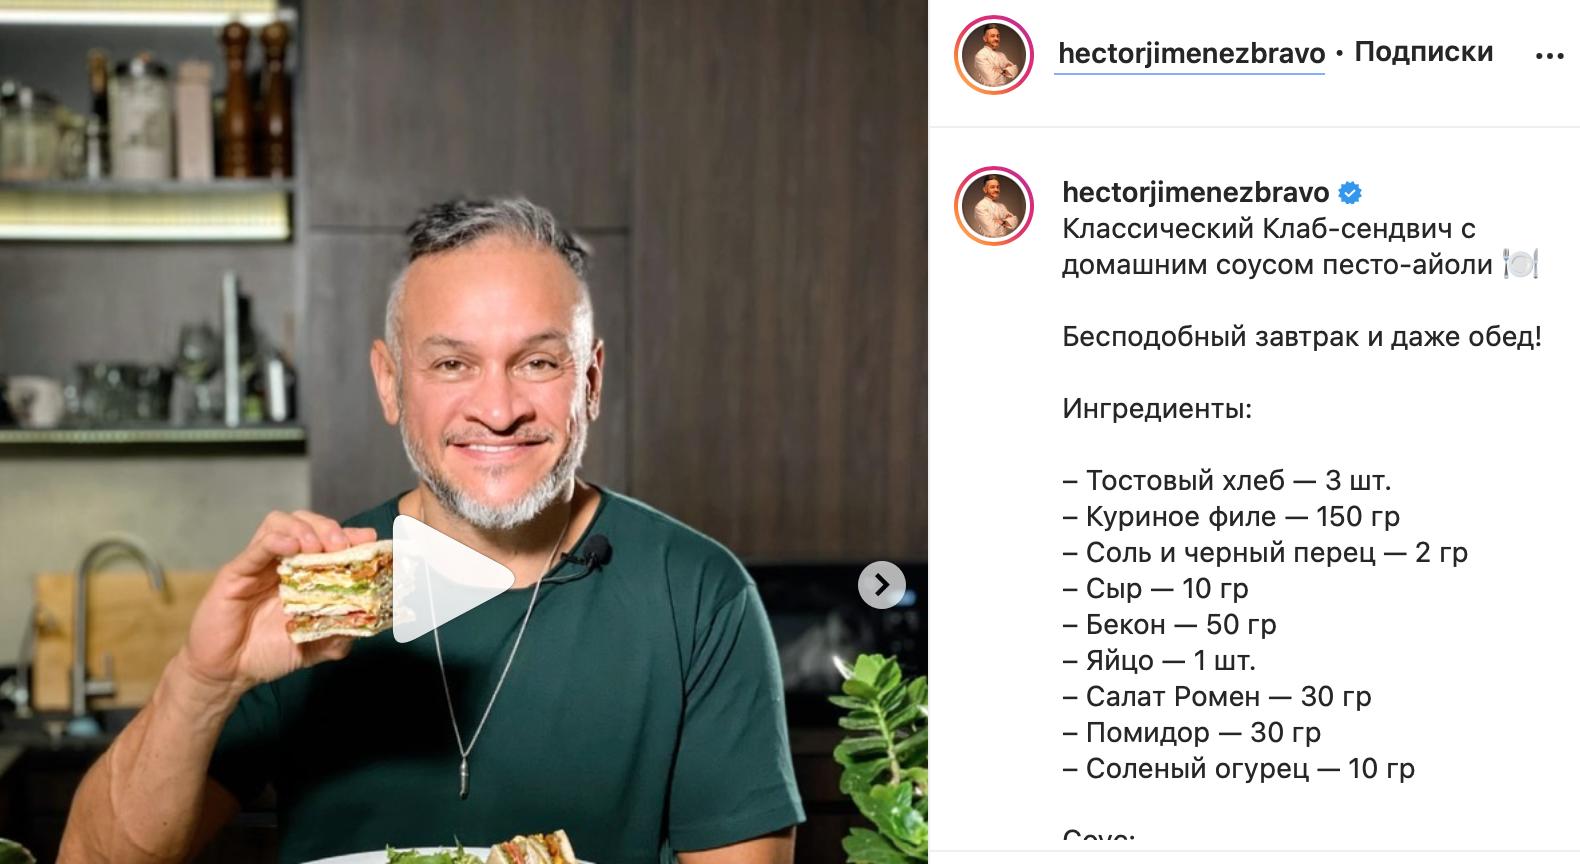 Рецепт клаб-сэндвичей